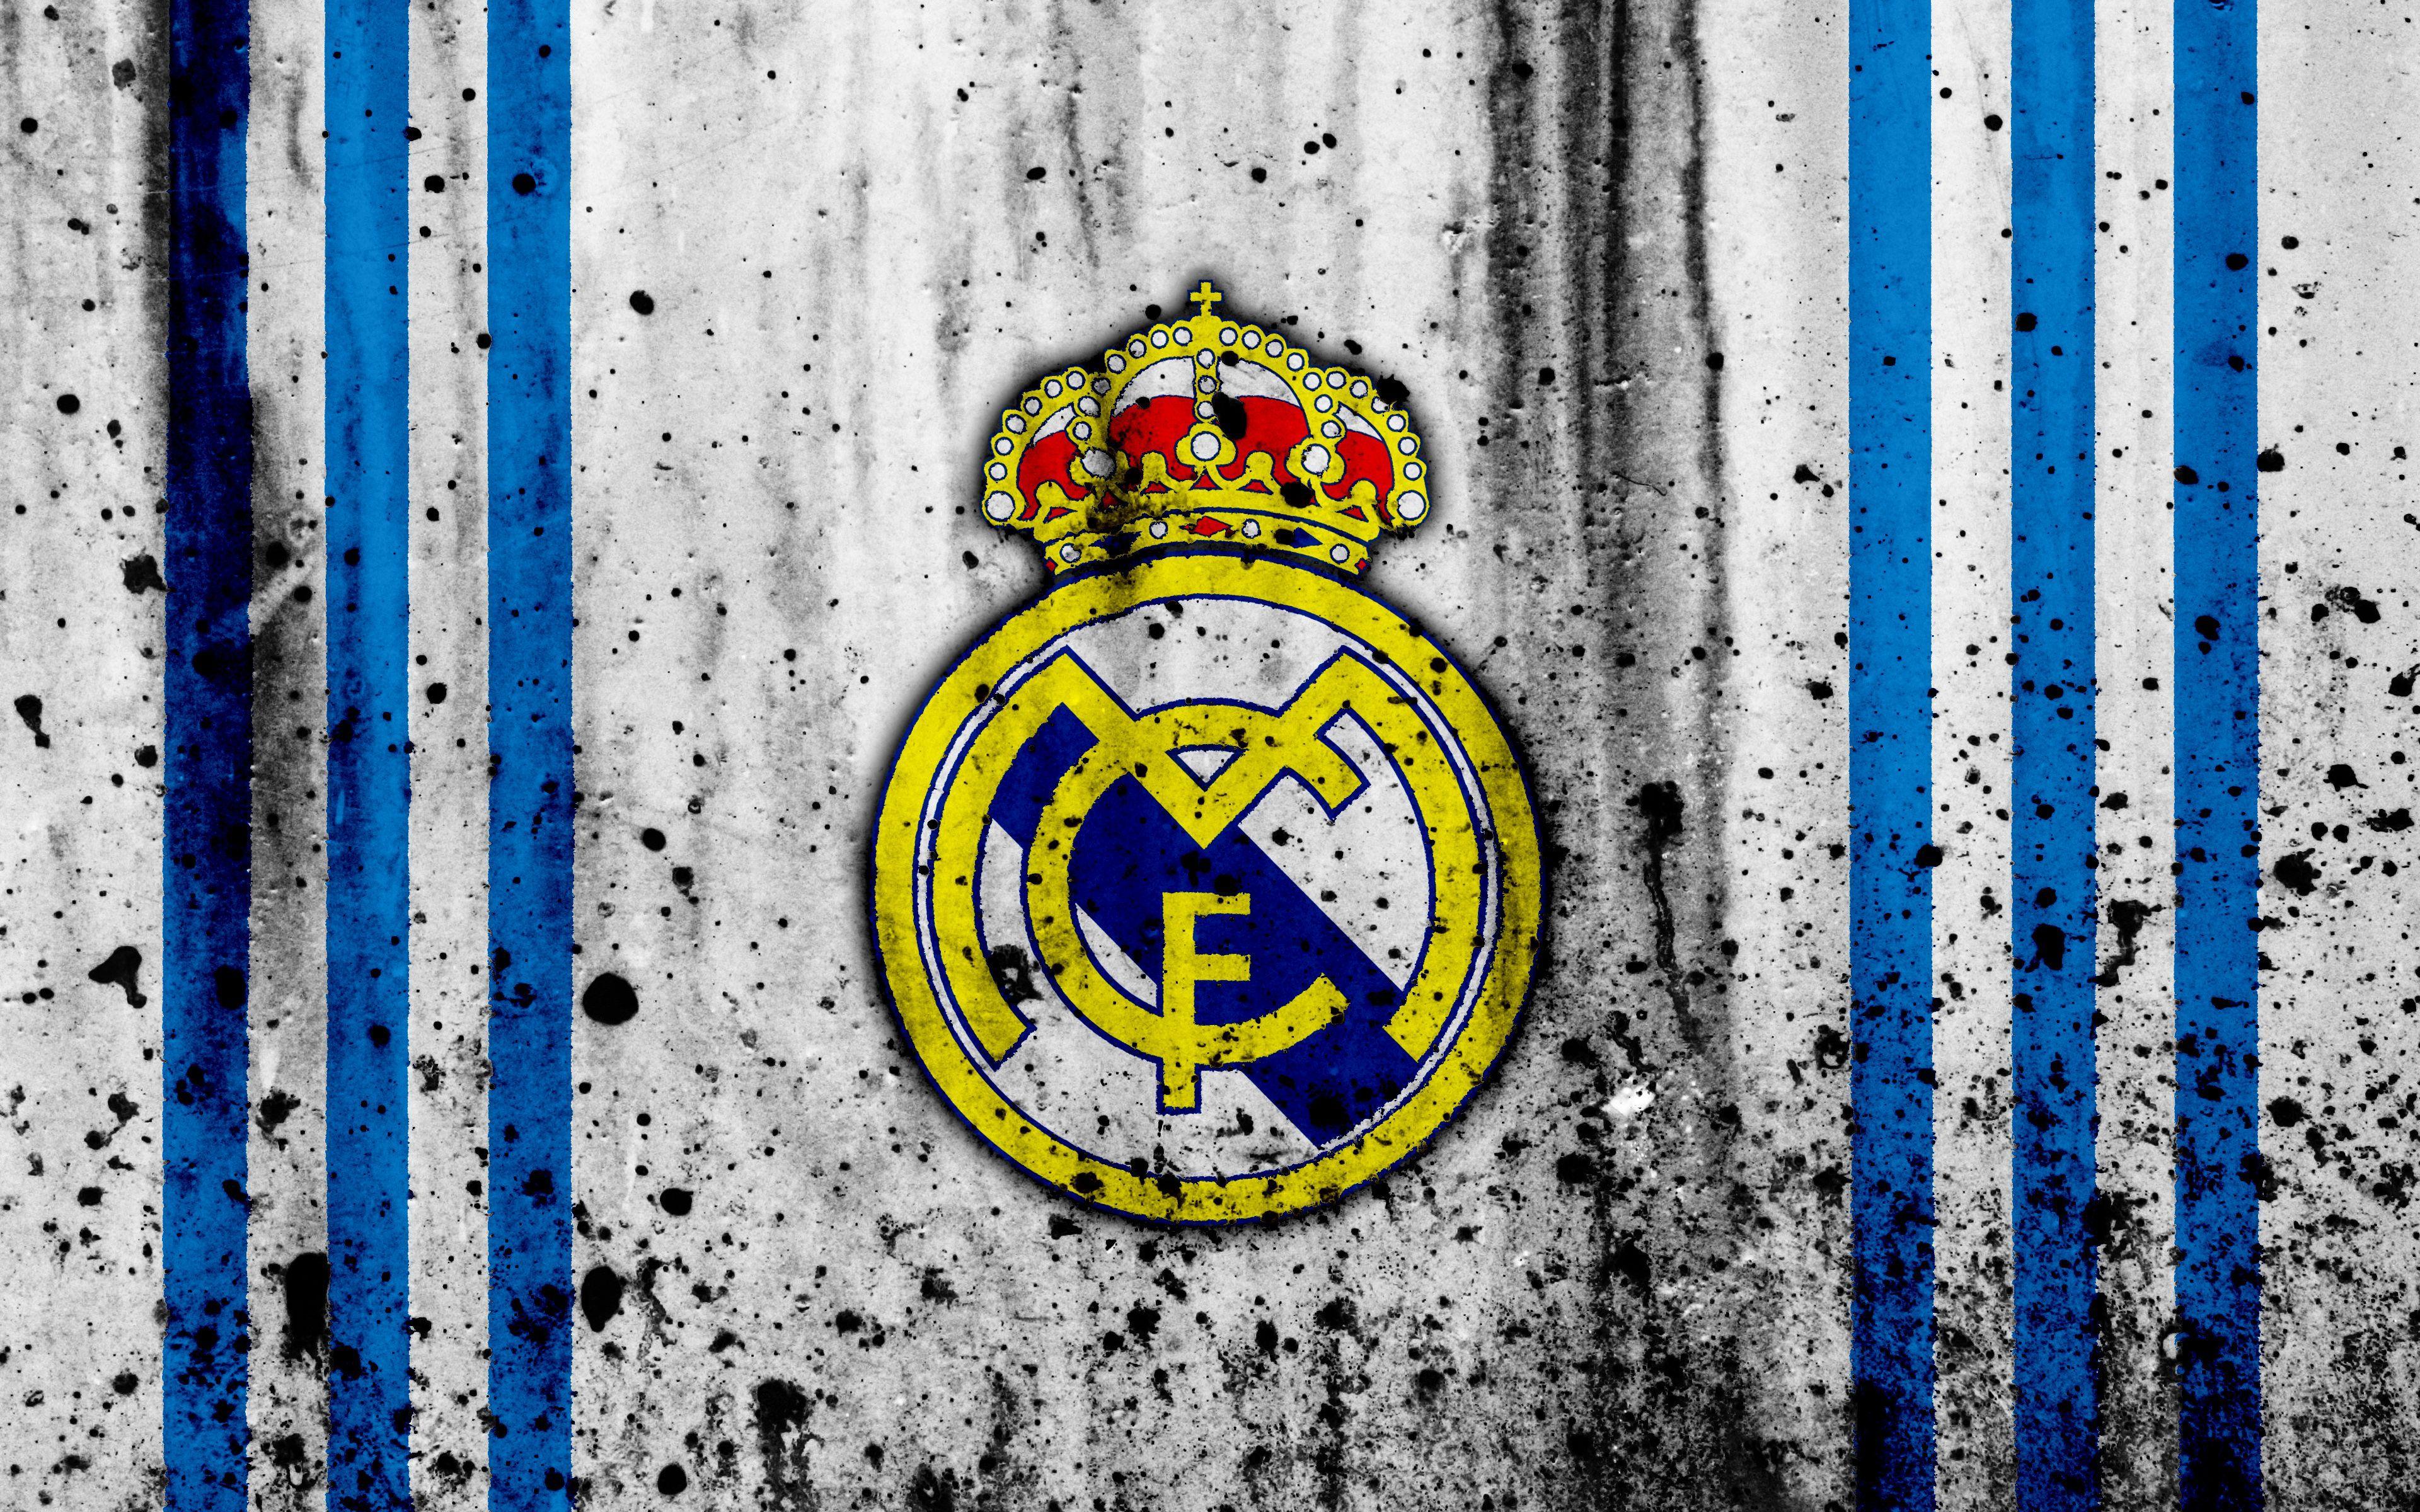 Real Madrid 4k Wallpapers Top Free Real Madrid 4k